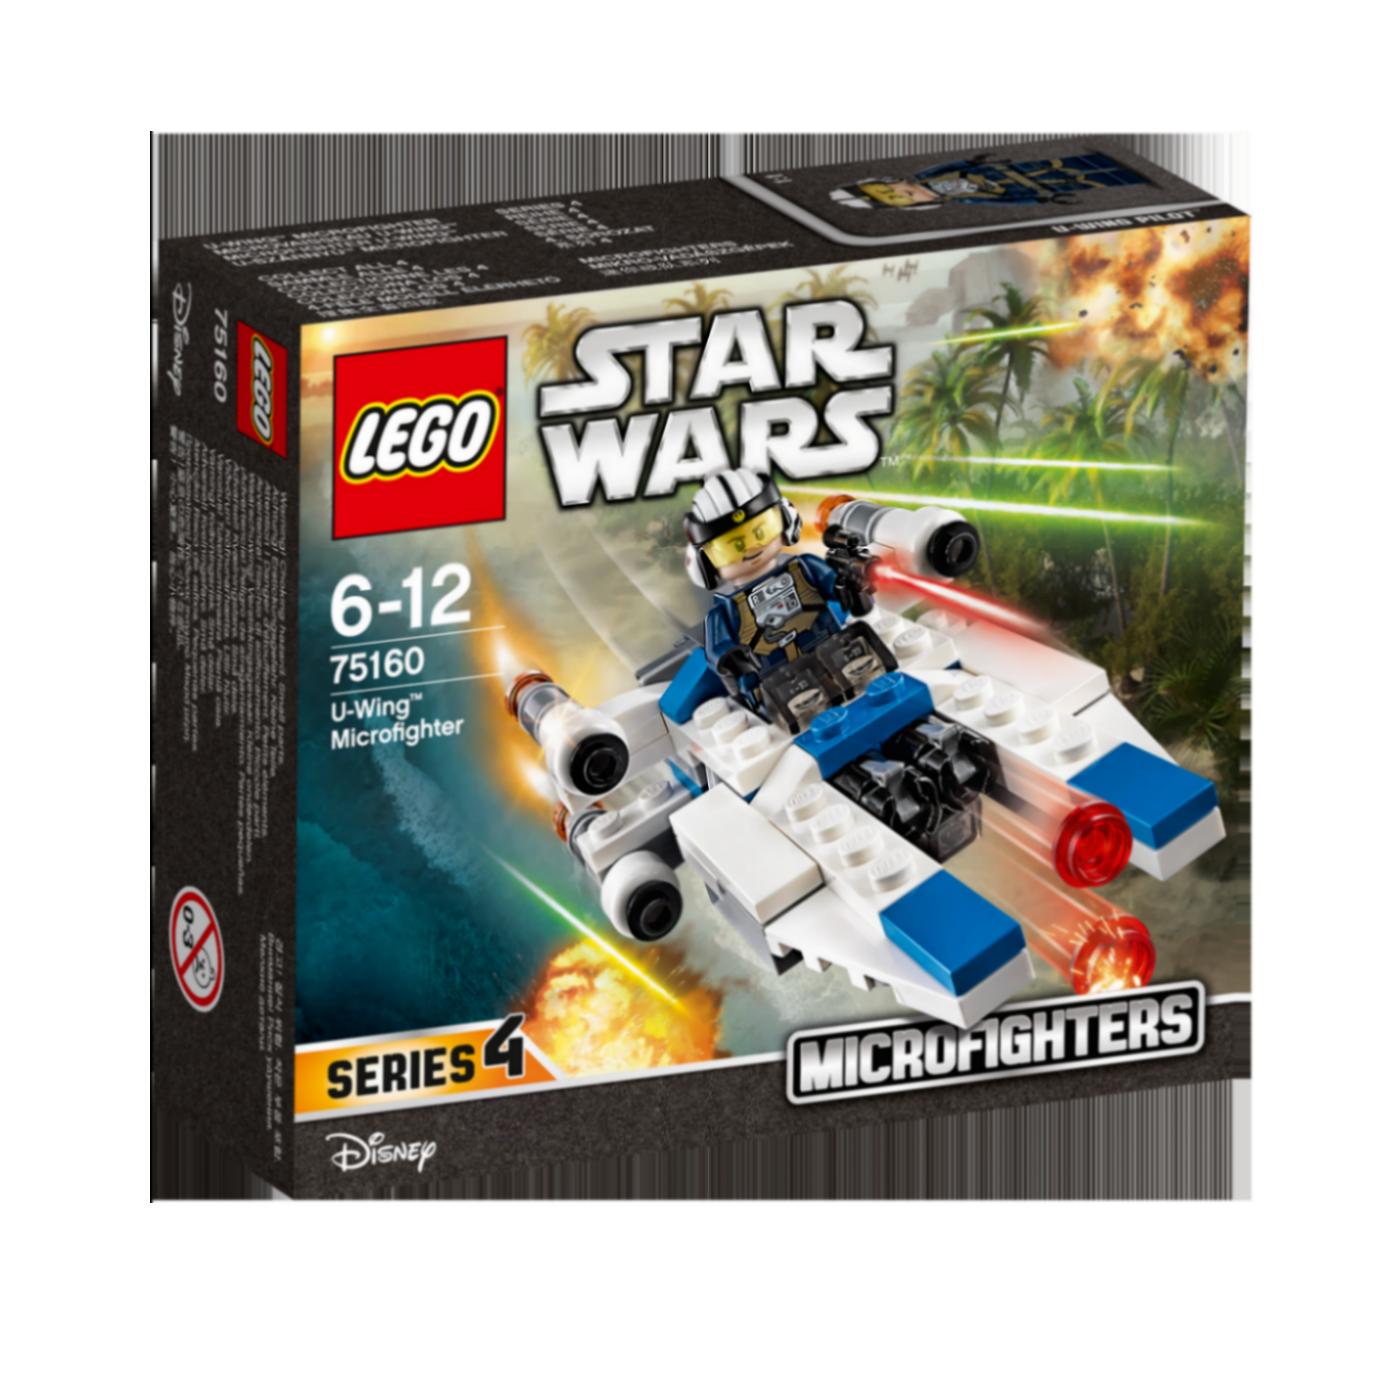 U-Wing Microfighter, LEGO Star Wars